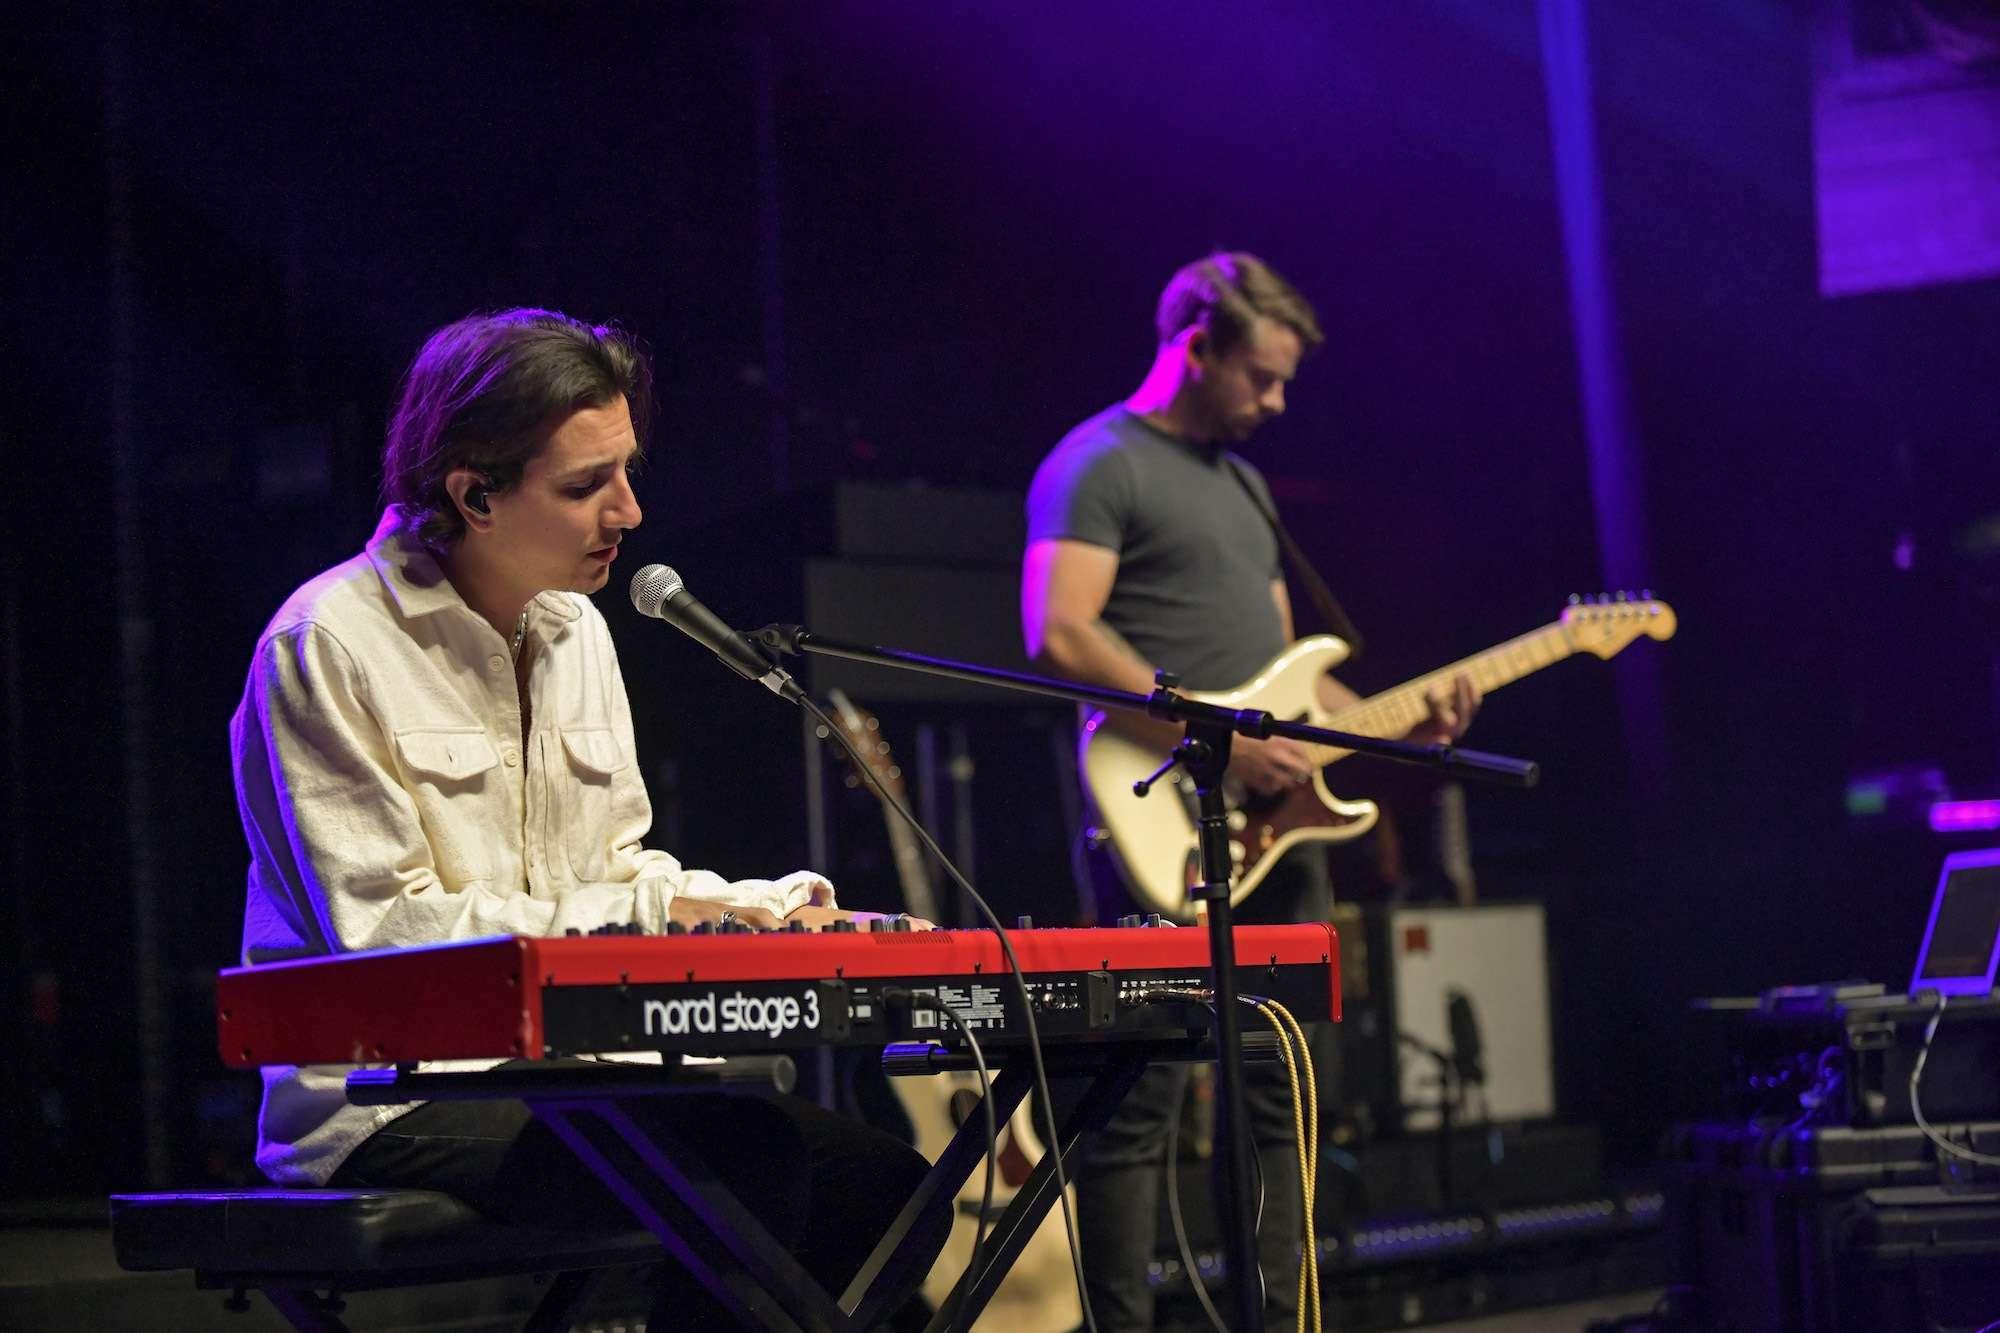 Anson Seabra Live at Riviera [GALLERY] 6